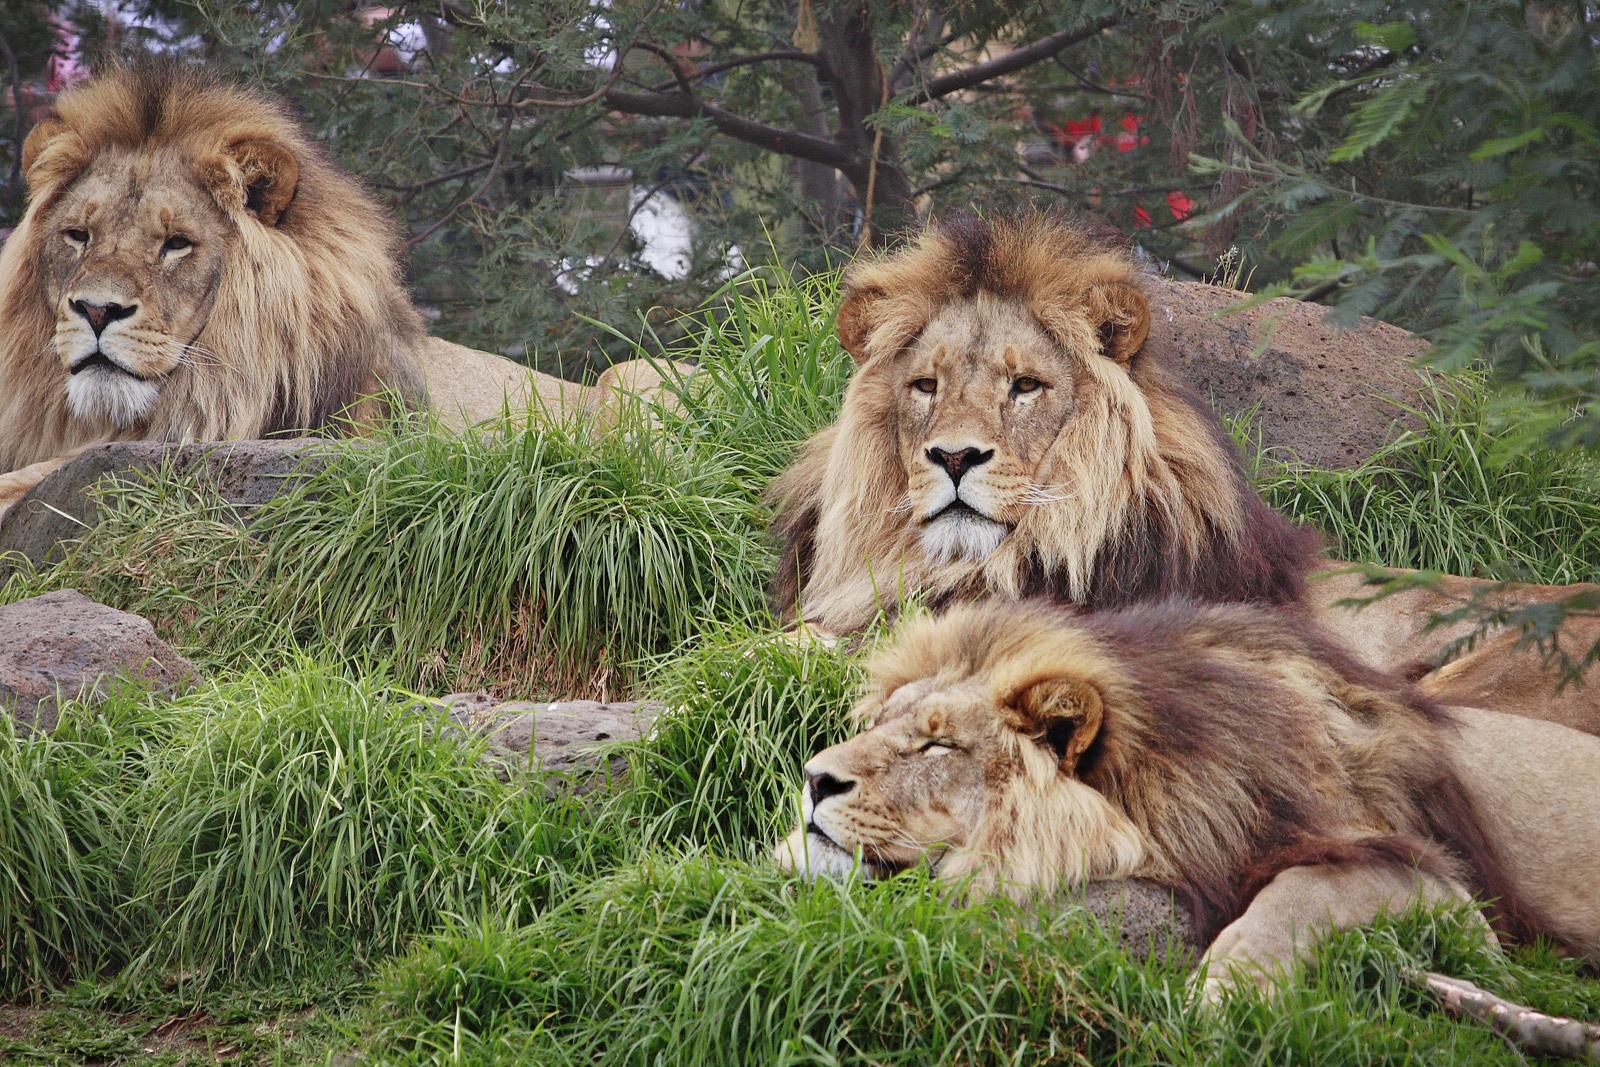 http://1.bp.blogspot.com/-_tjQVQSYBpY/TsuWChjJpKI/AAAAAAAAA-c/PtR6fP3CZvA/s1600/Lion%2Bwallpapers%2Bhd%2B1%255D.jpg